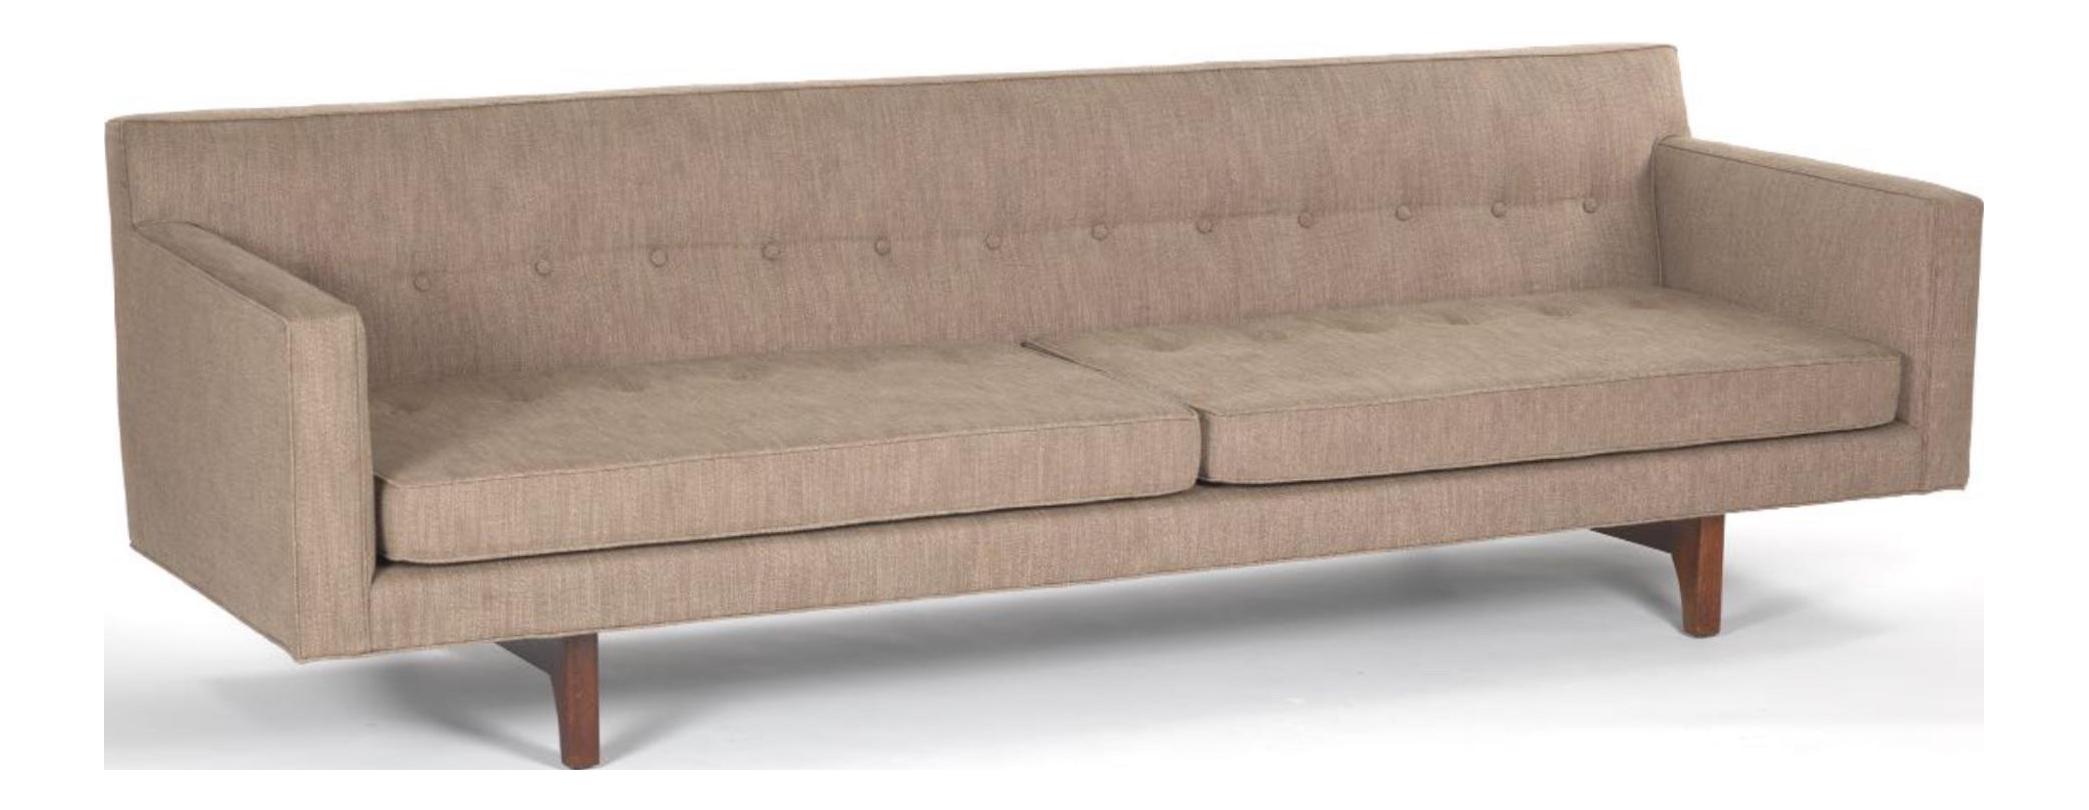 Bracket Back Sofa By Edward Wormley For Dunbar   Image 1 Of 6